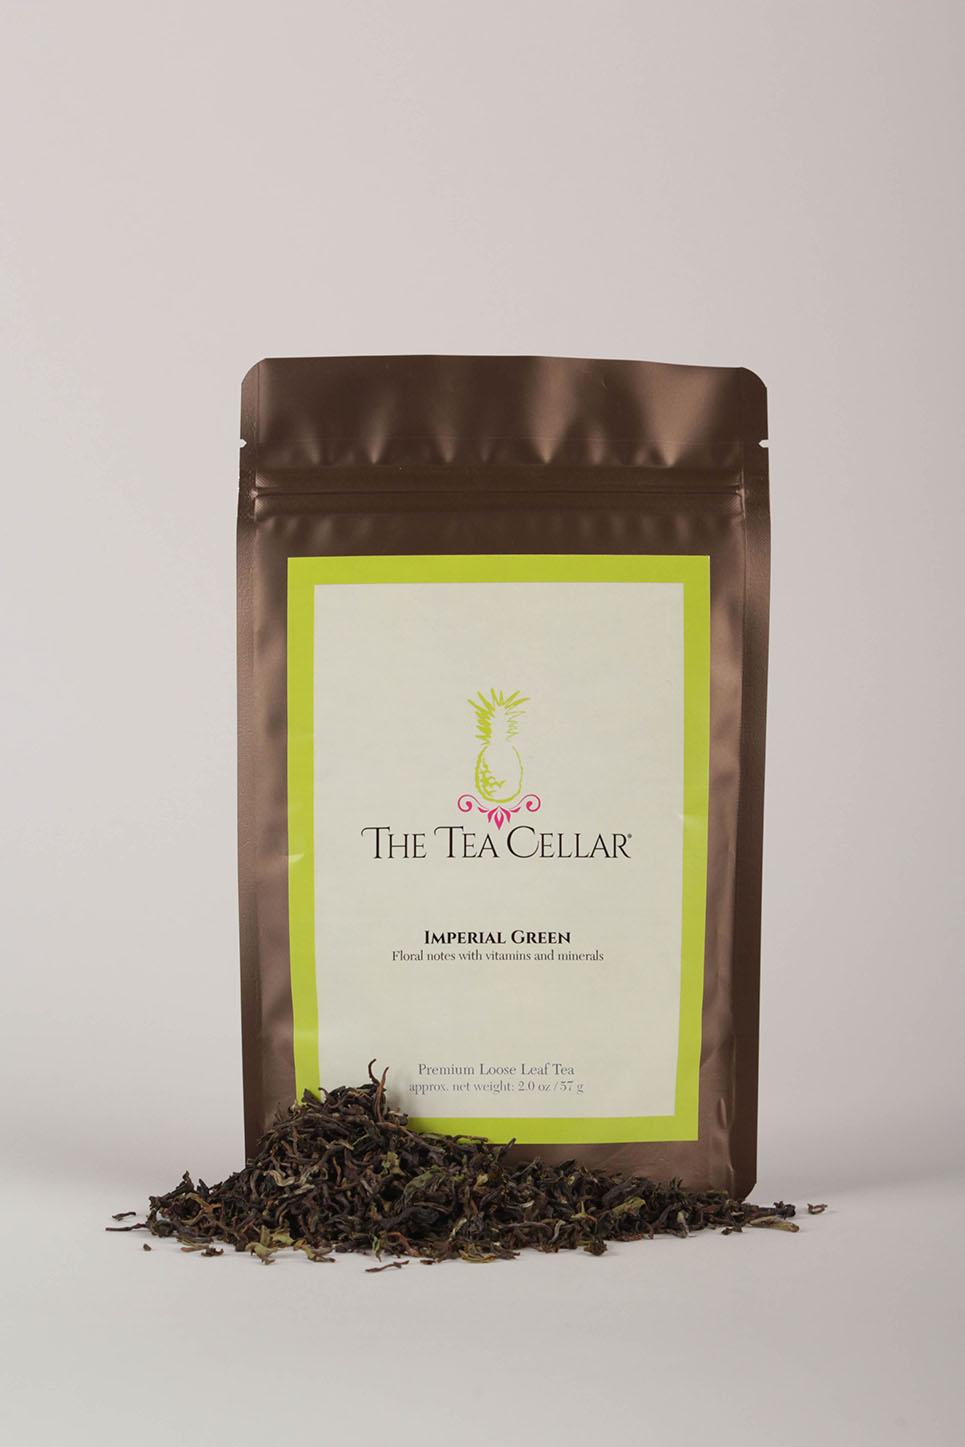 Imperial Green Darjeeling Tea